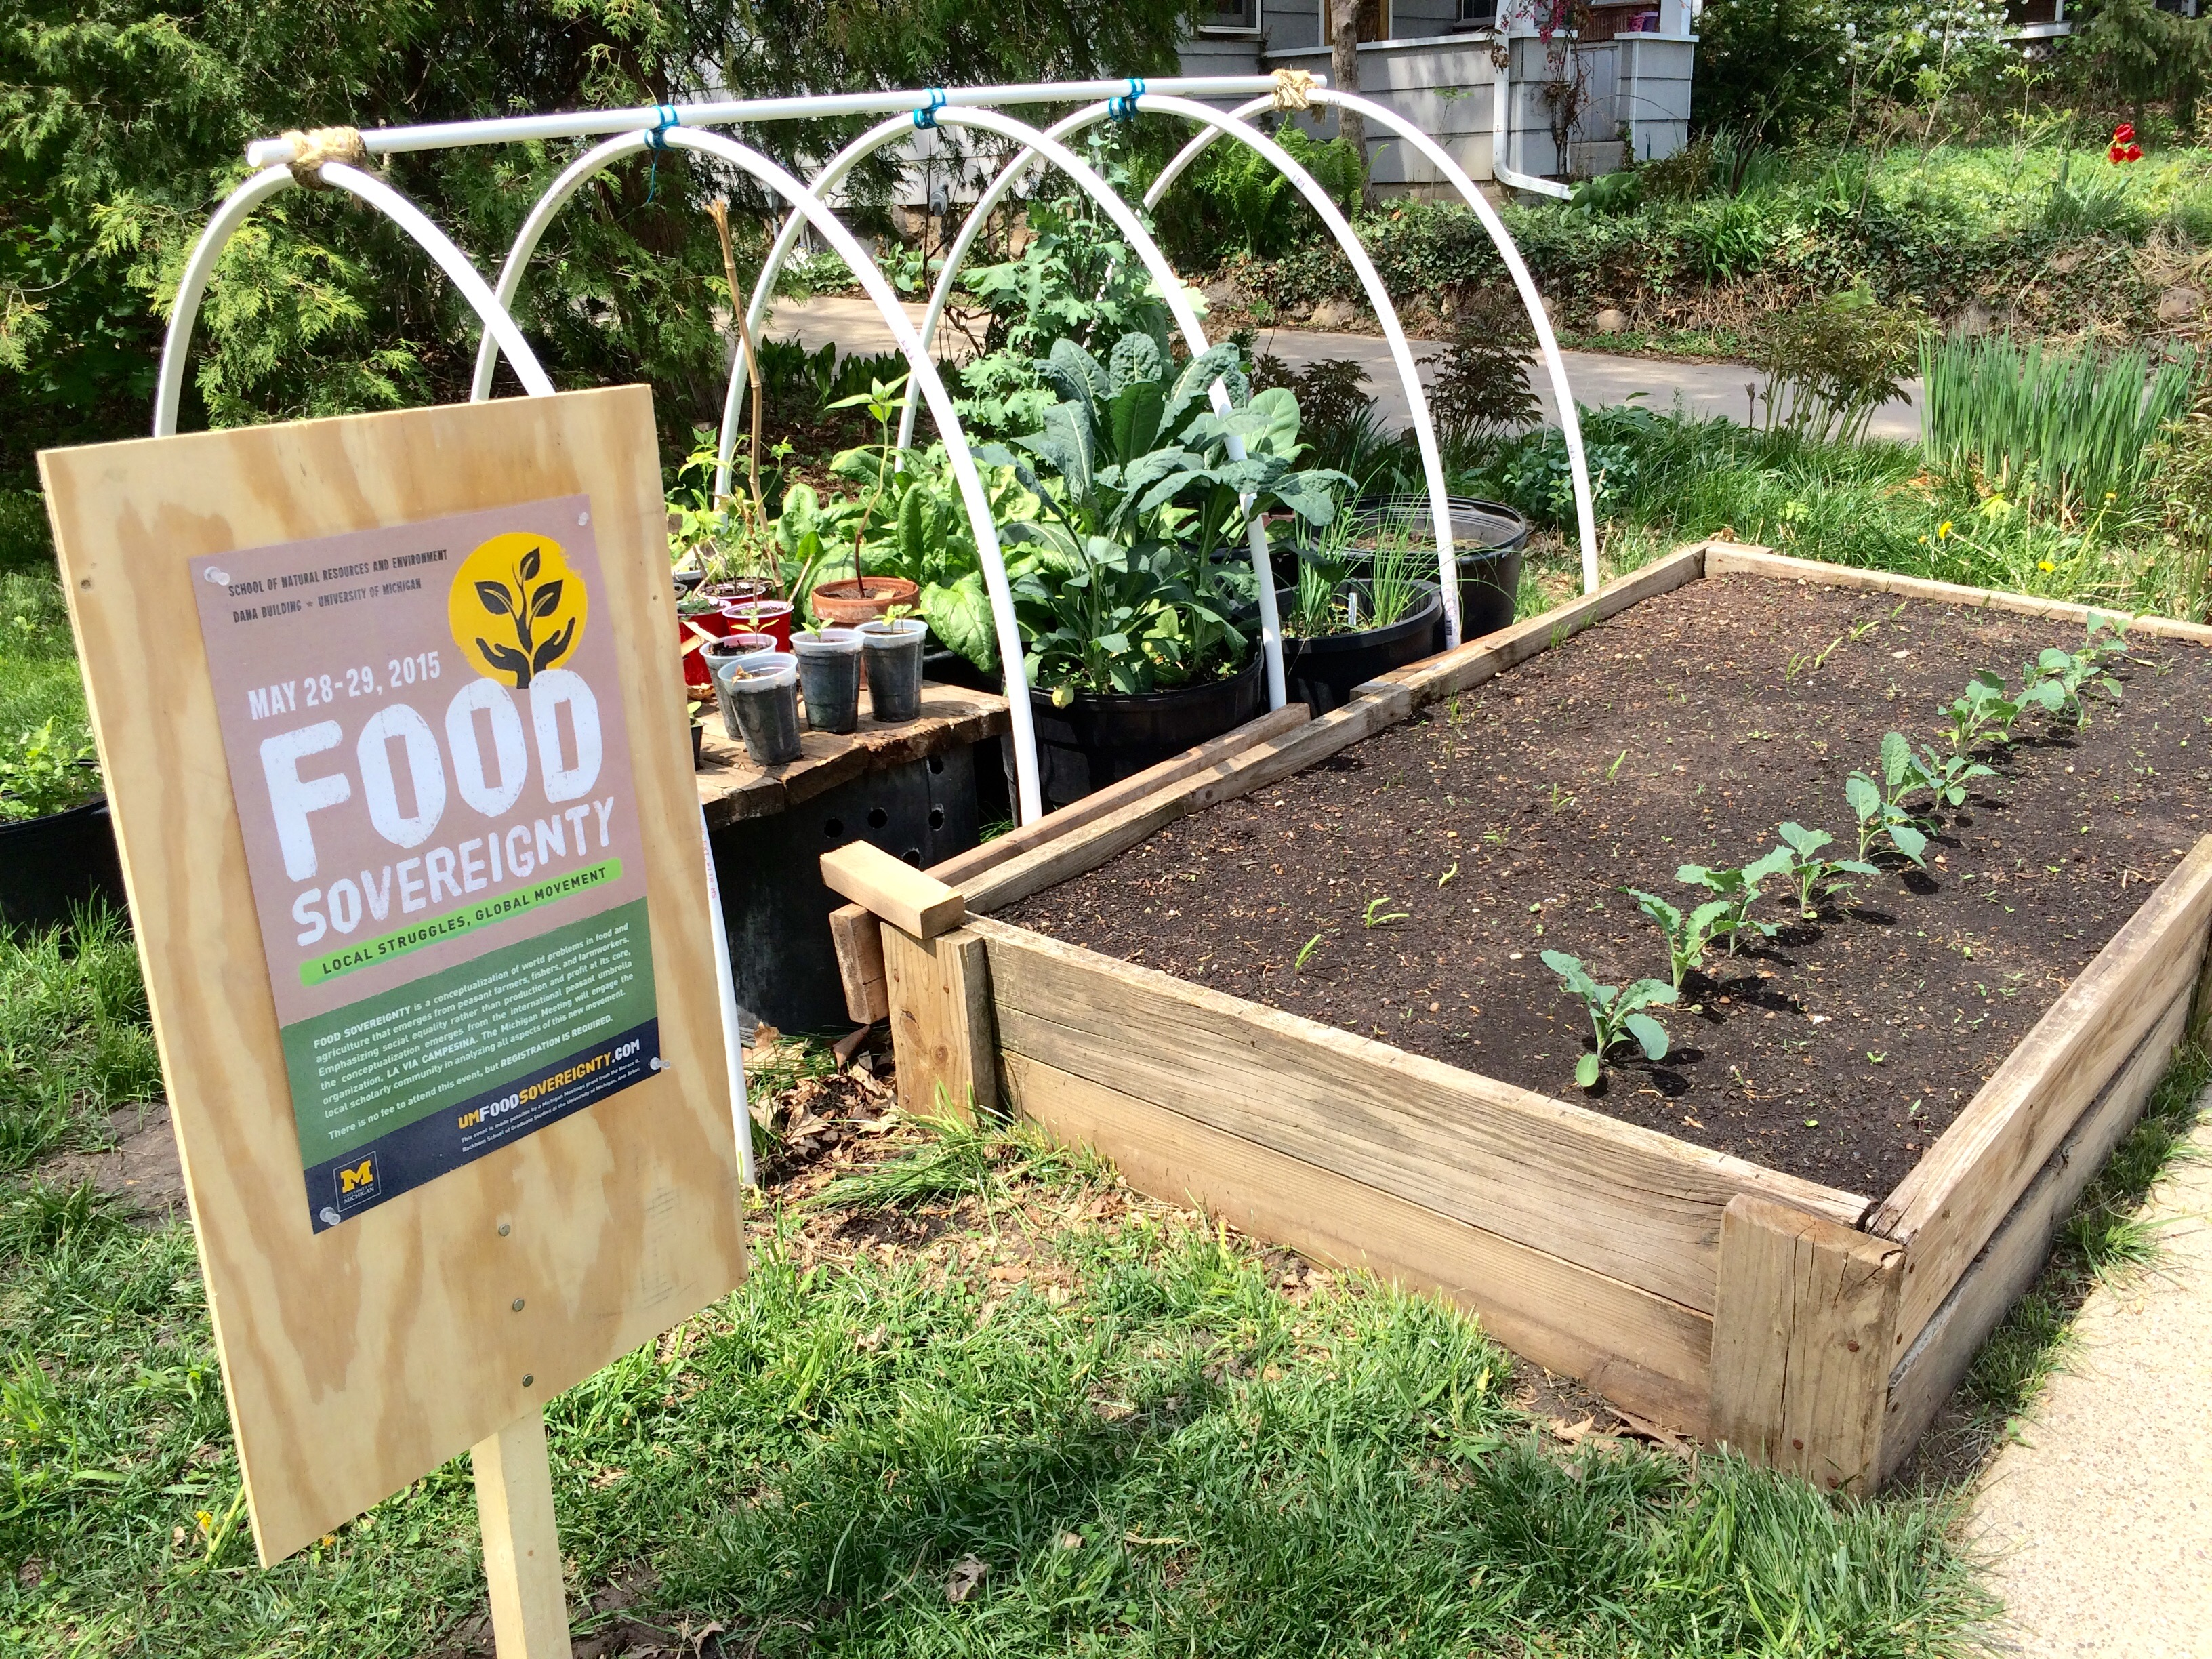 foodsov_garden